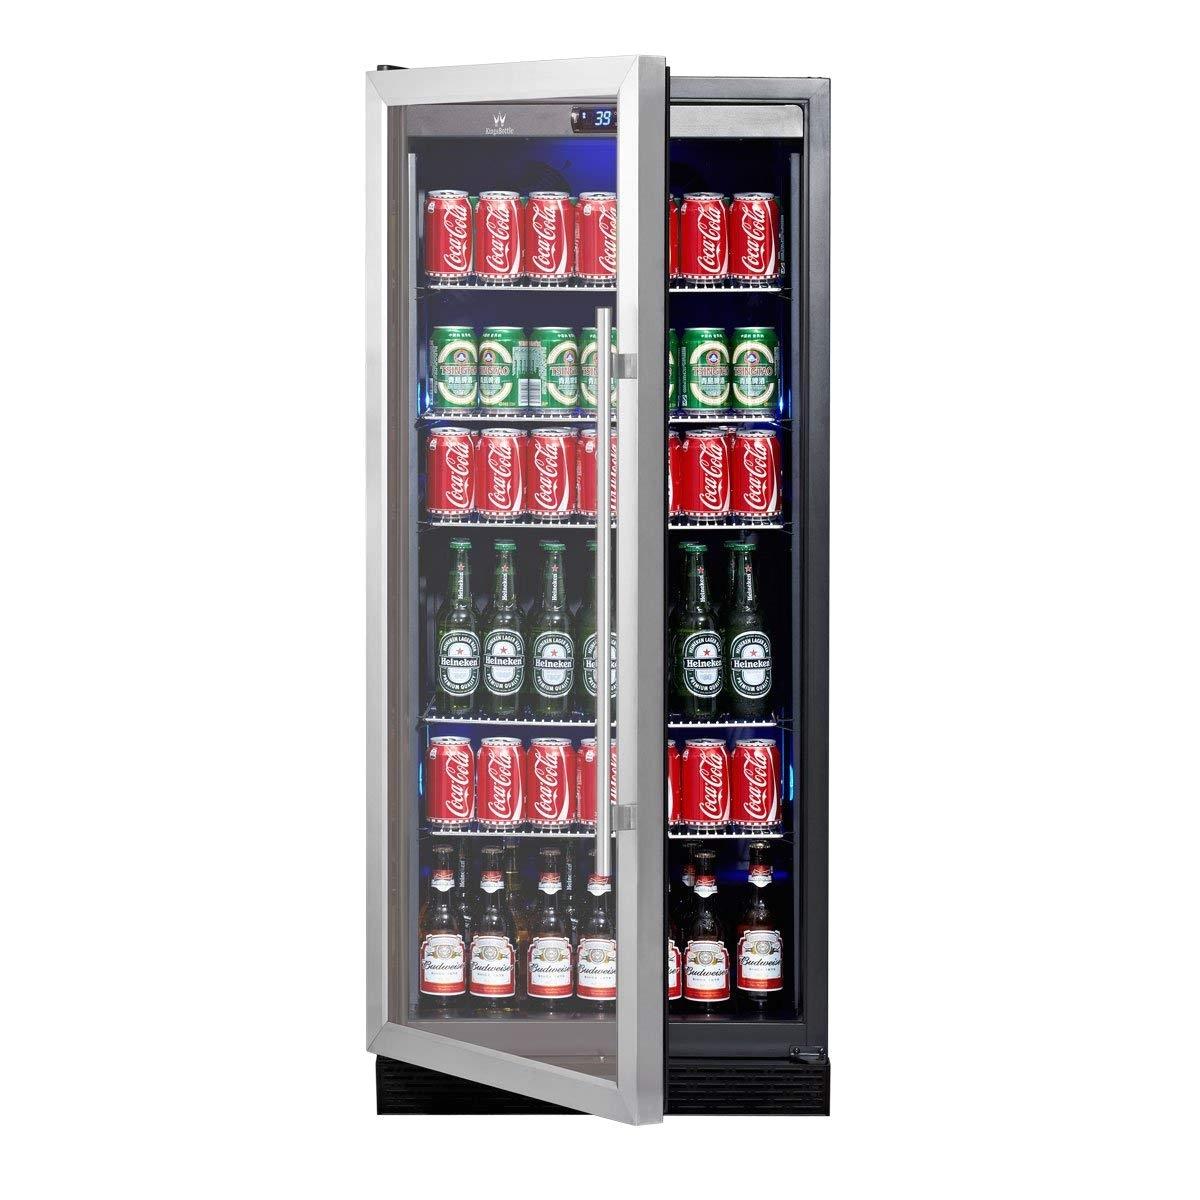 Beer Glass Rack for Freezer Amazon Com Beverage Cooler Beer Cooler Upright Stainless Steel